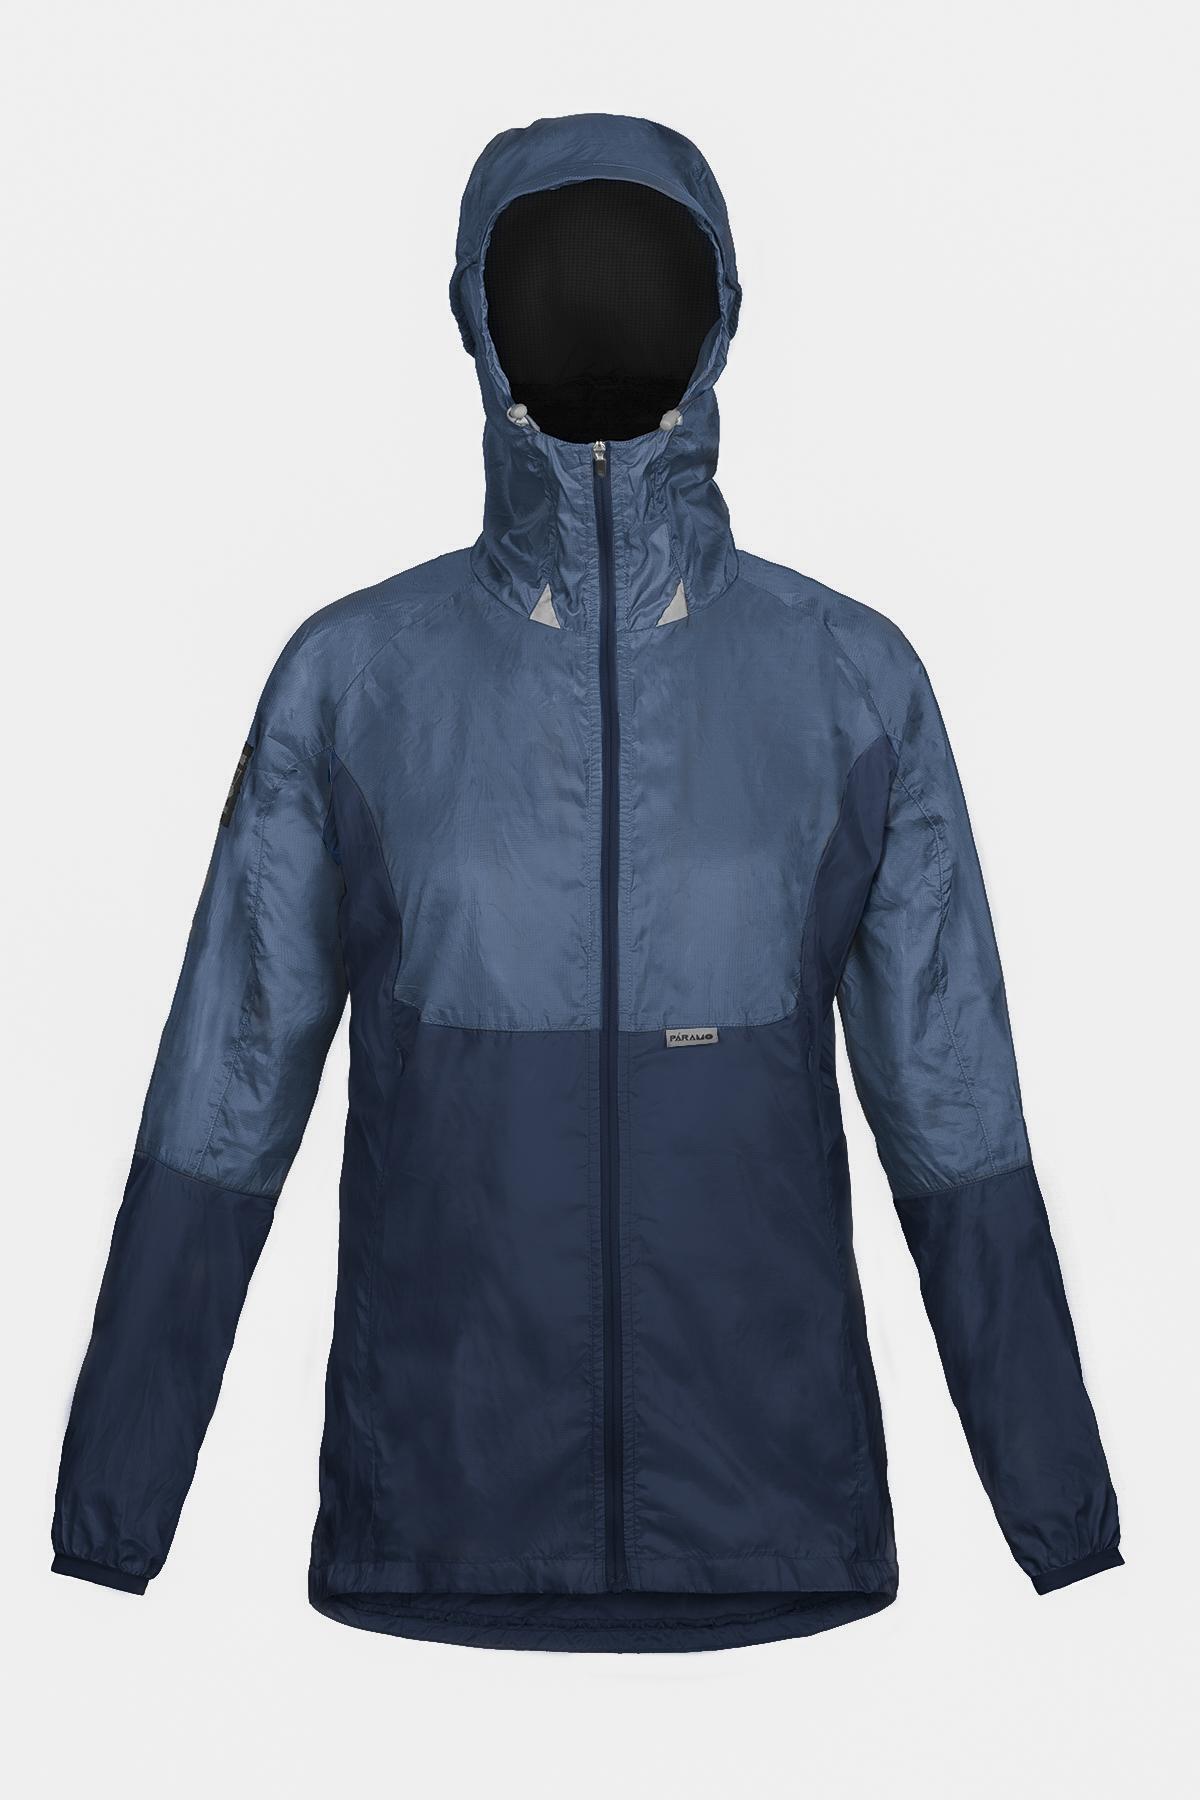 Paramo Women's Alize Windproof Jacket